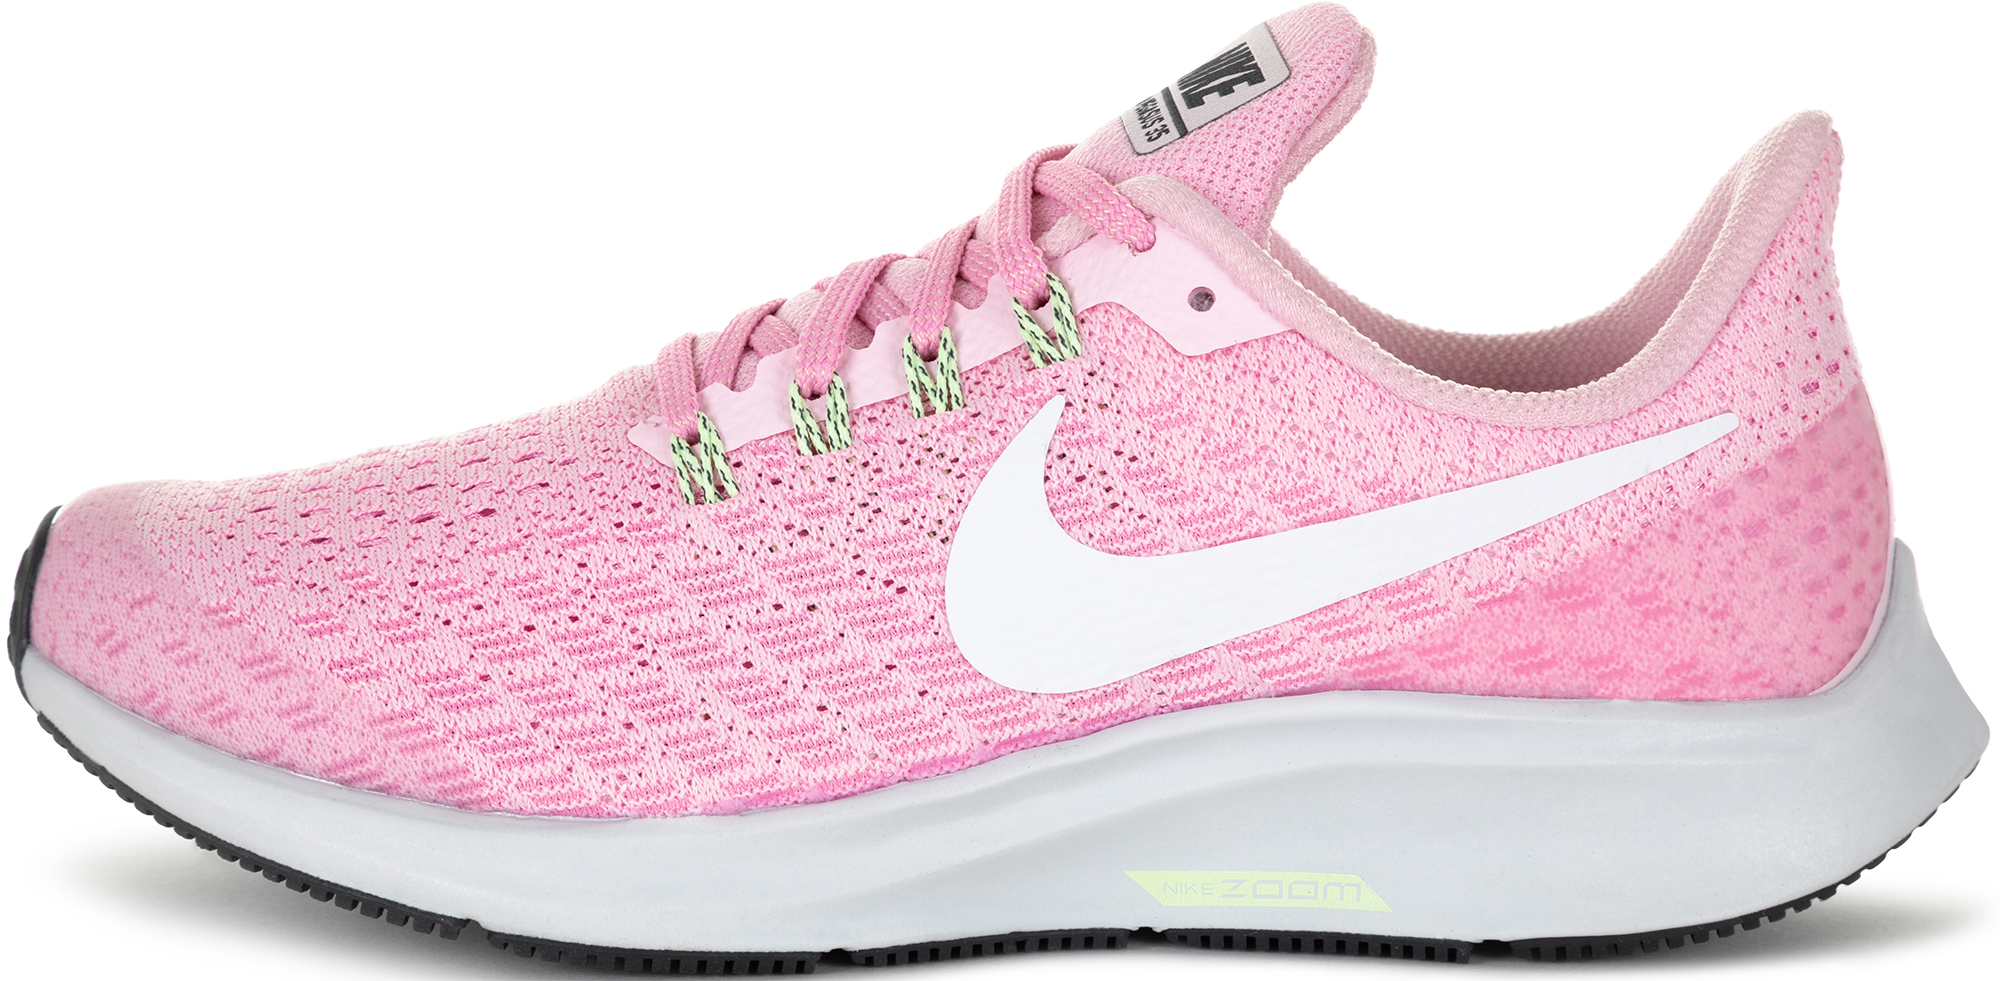 Nike Кроссовки для девочек Nike Air Zoom Pegasus 35, размер 39